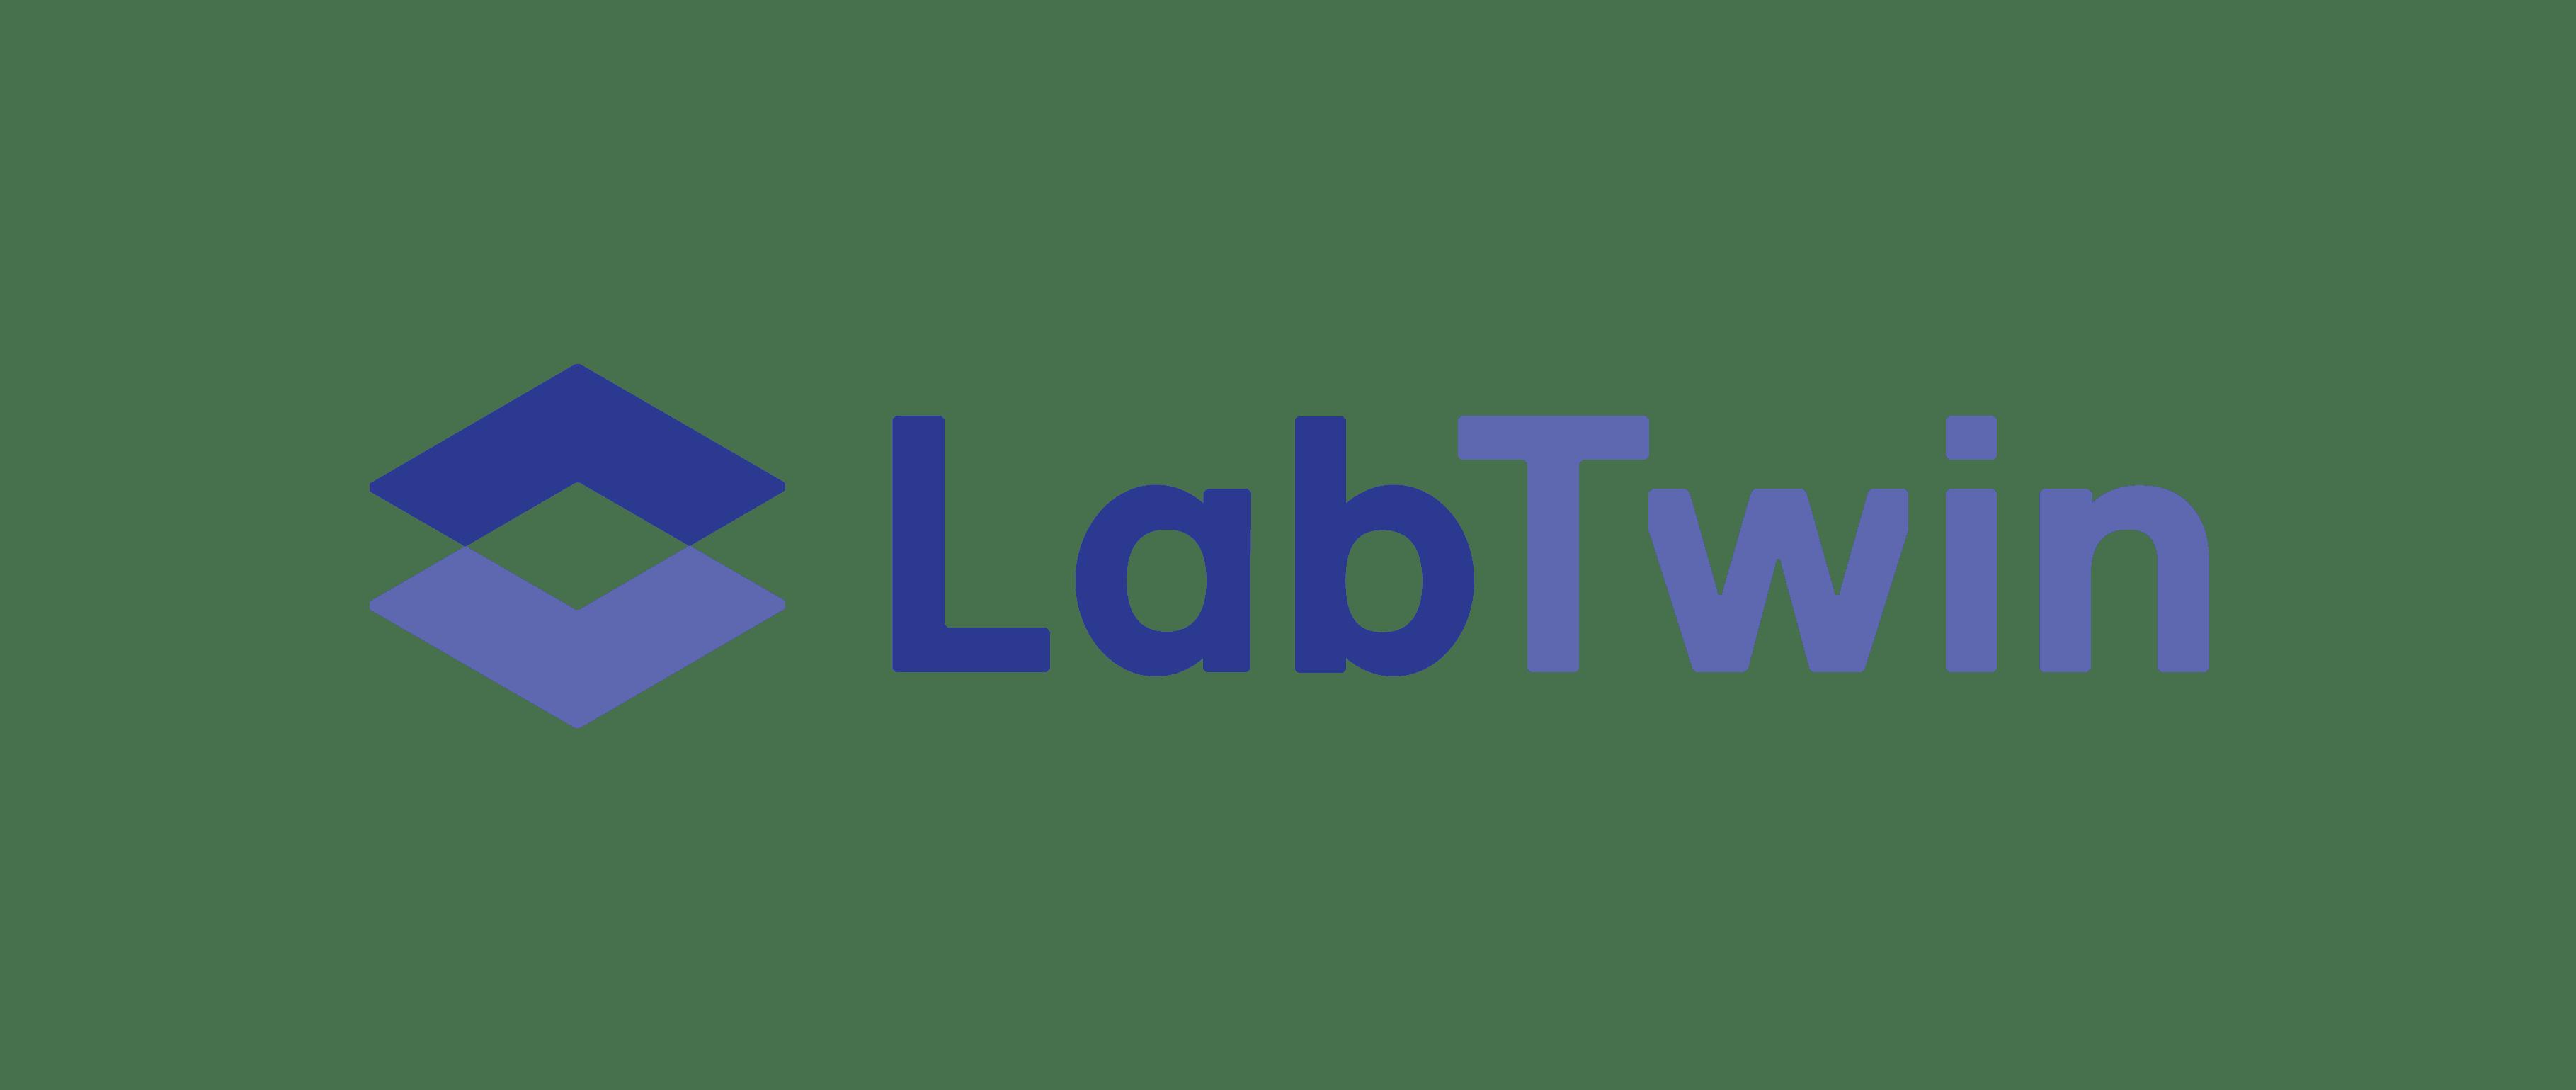 LabTwin   Crunchbase Company Profile & Funding